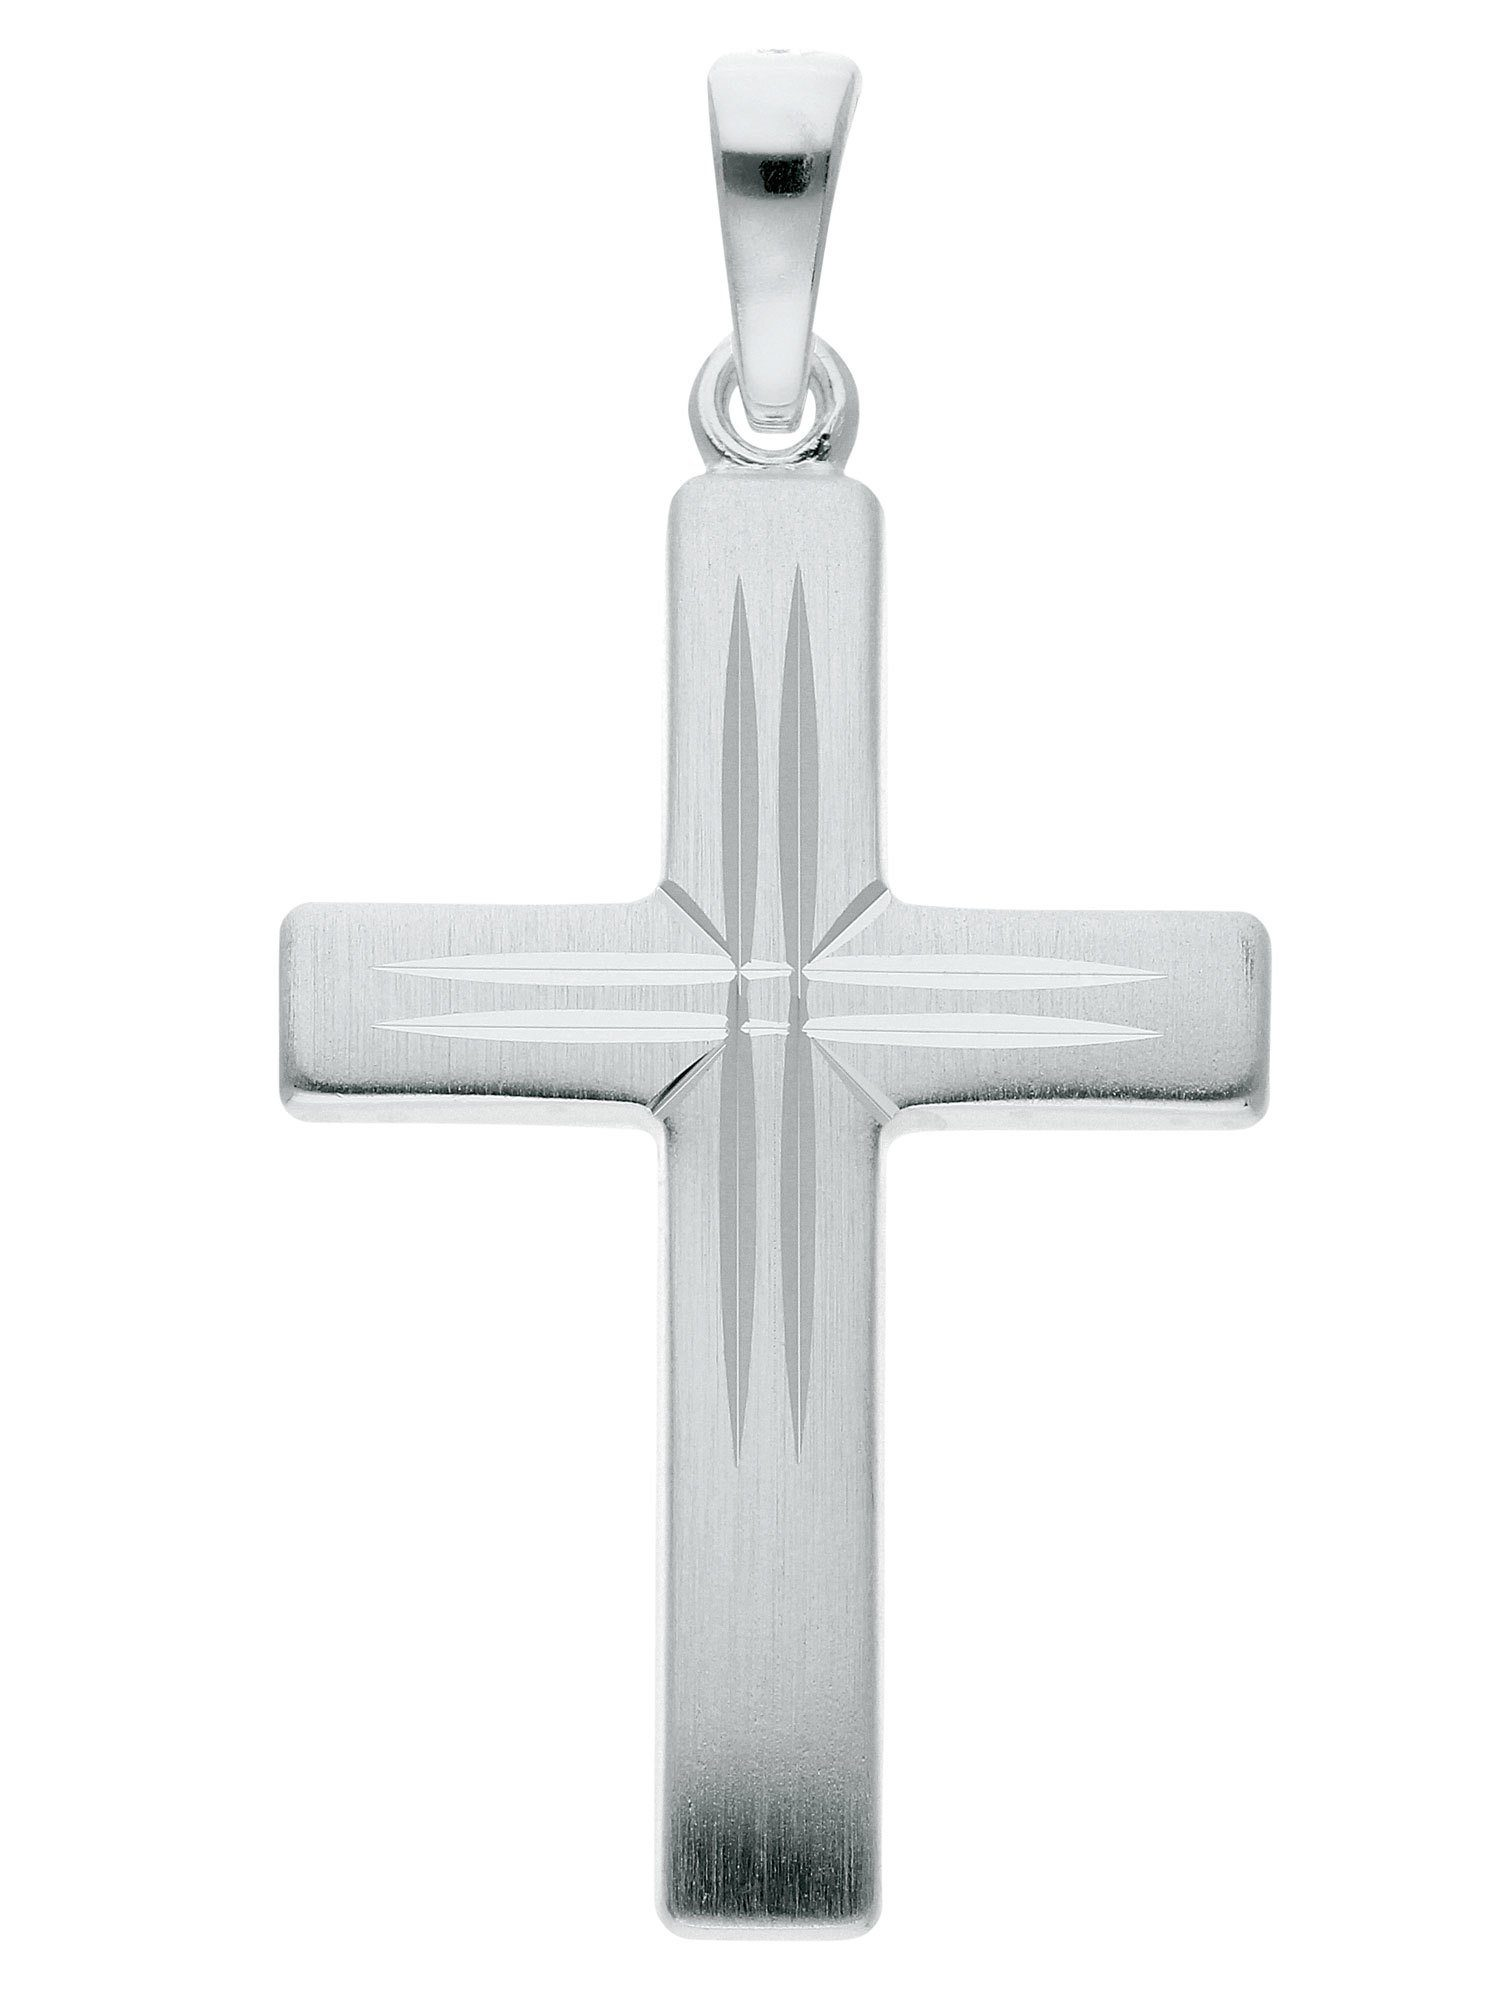 Adelia´s Silver Kreuz Kettenanhänger Sterling Anhänger« 925 Online Kaufen »silber Silber vm0nw8N